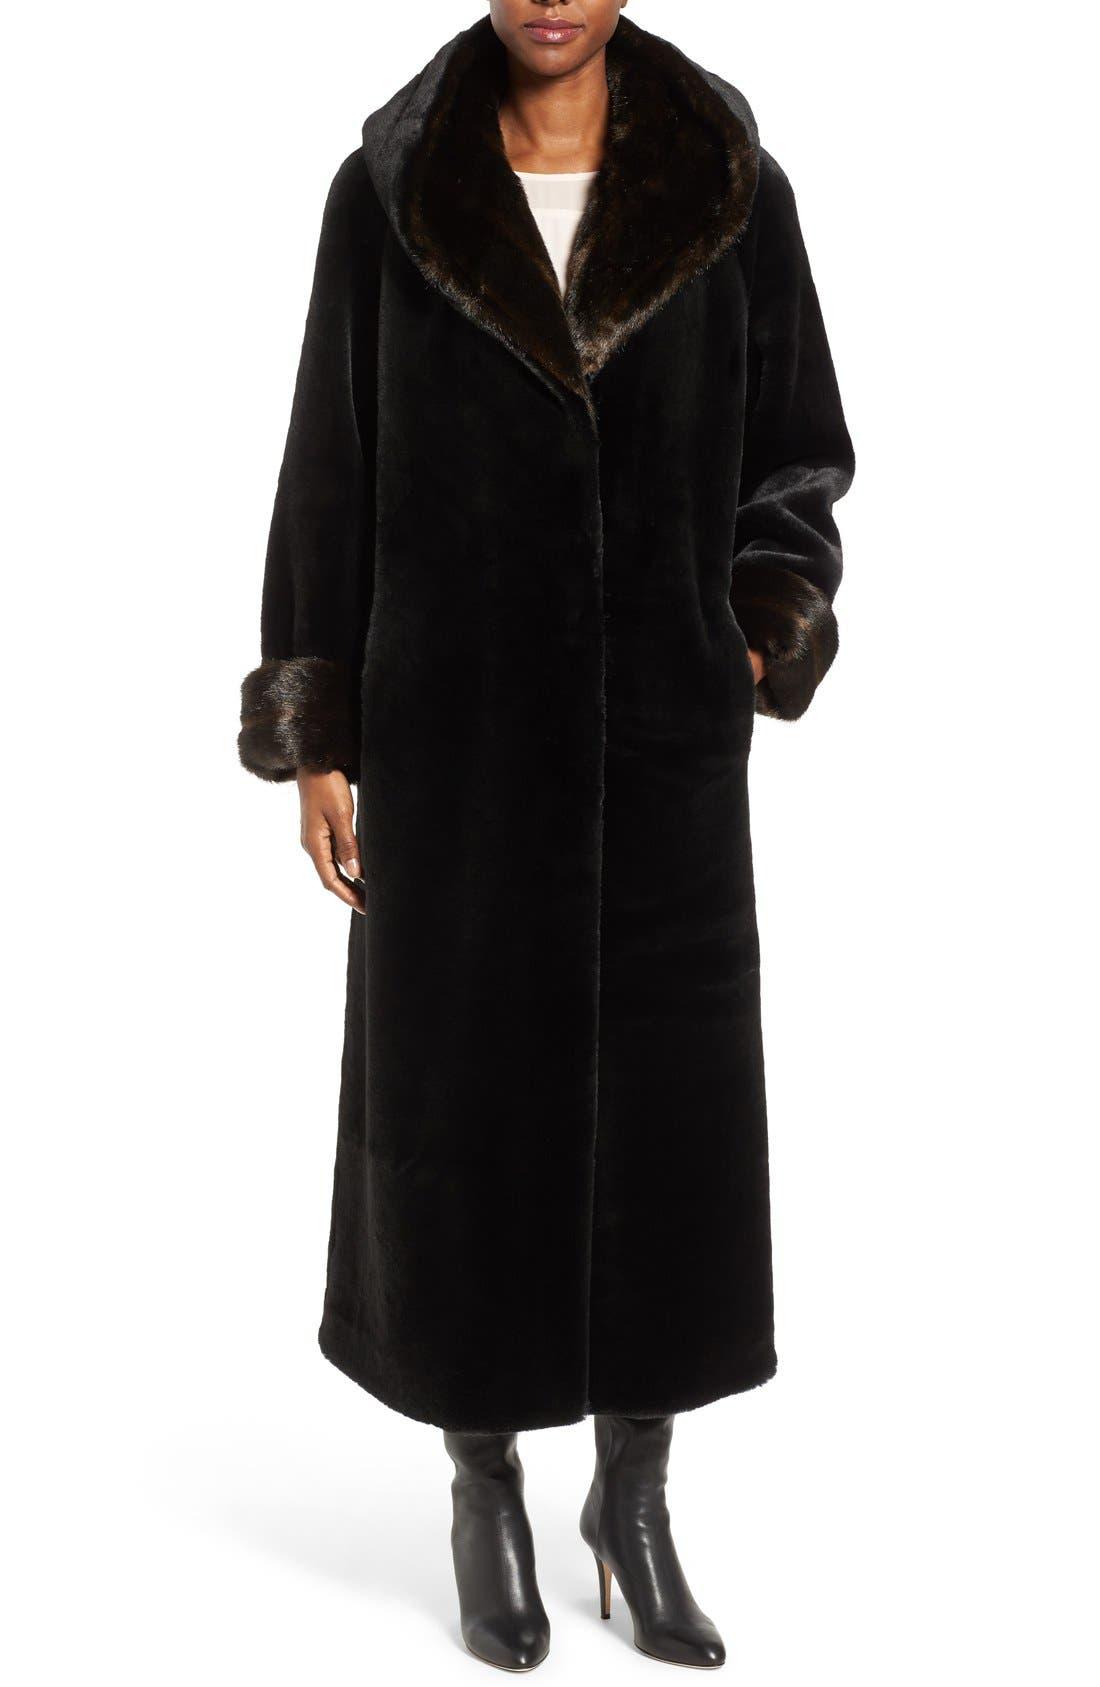 Alternate Image 1 Selected - Gallery Hooded Full-Length Faux Fur Coat